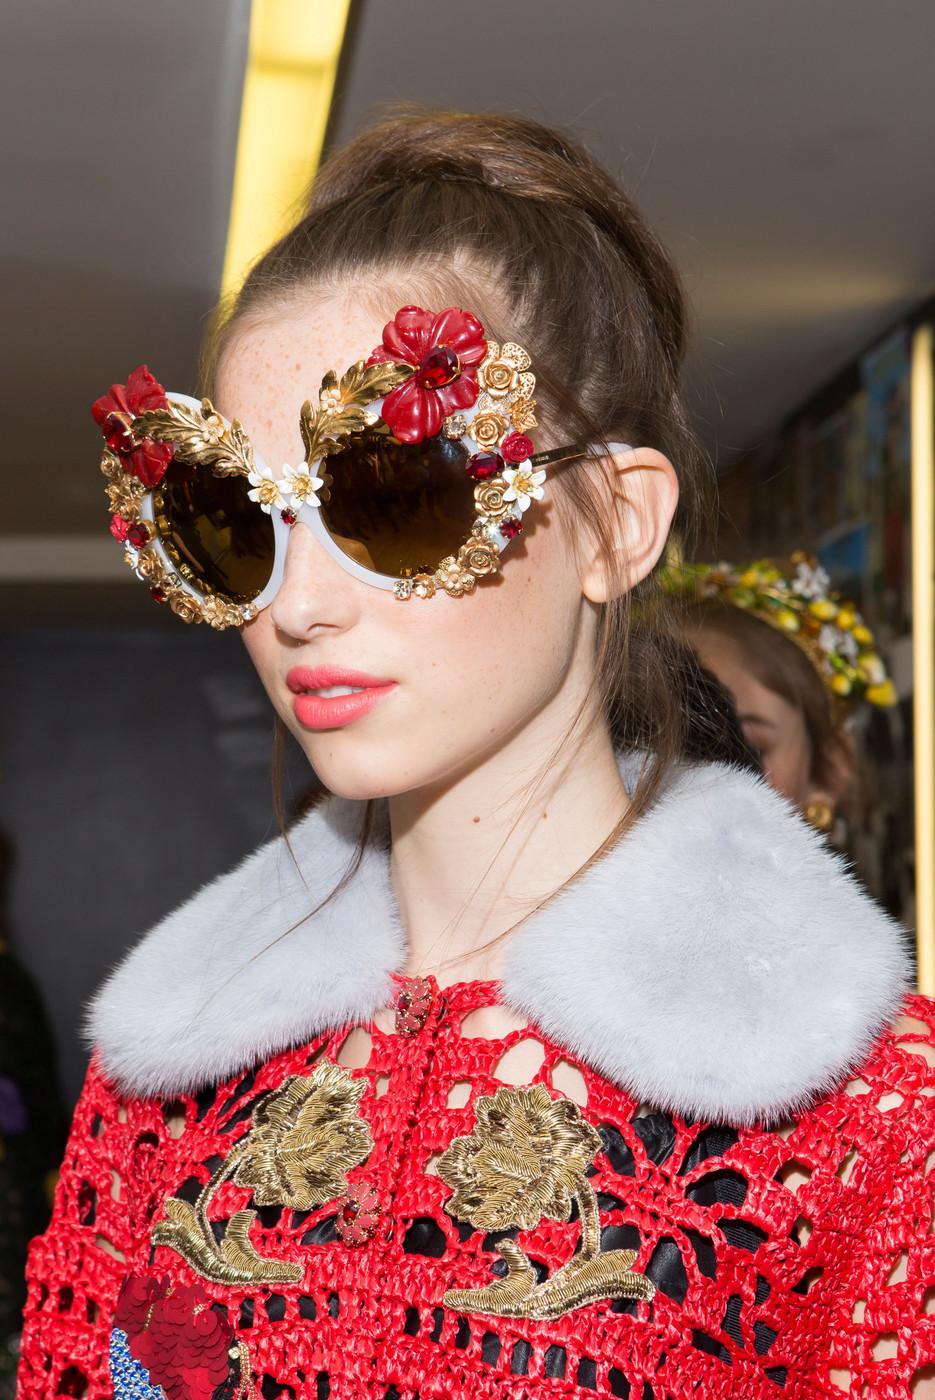 Dolce+Gabbana+Spring+2016+Backstage+xmwnGSihfF7x.jpg